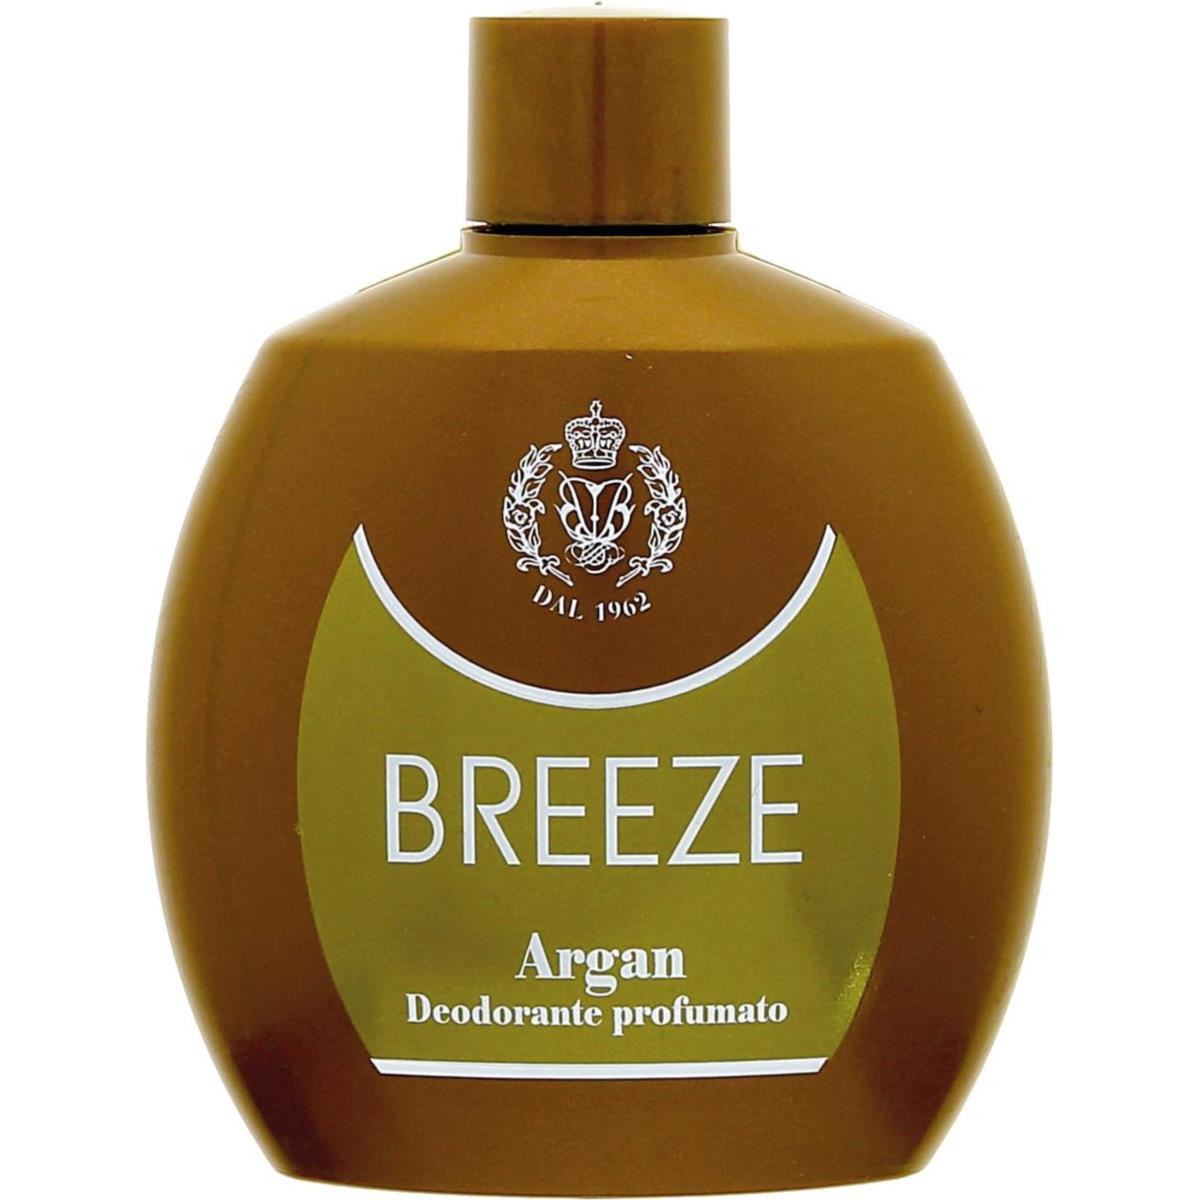 Deodorante Breeze Argan ml 100